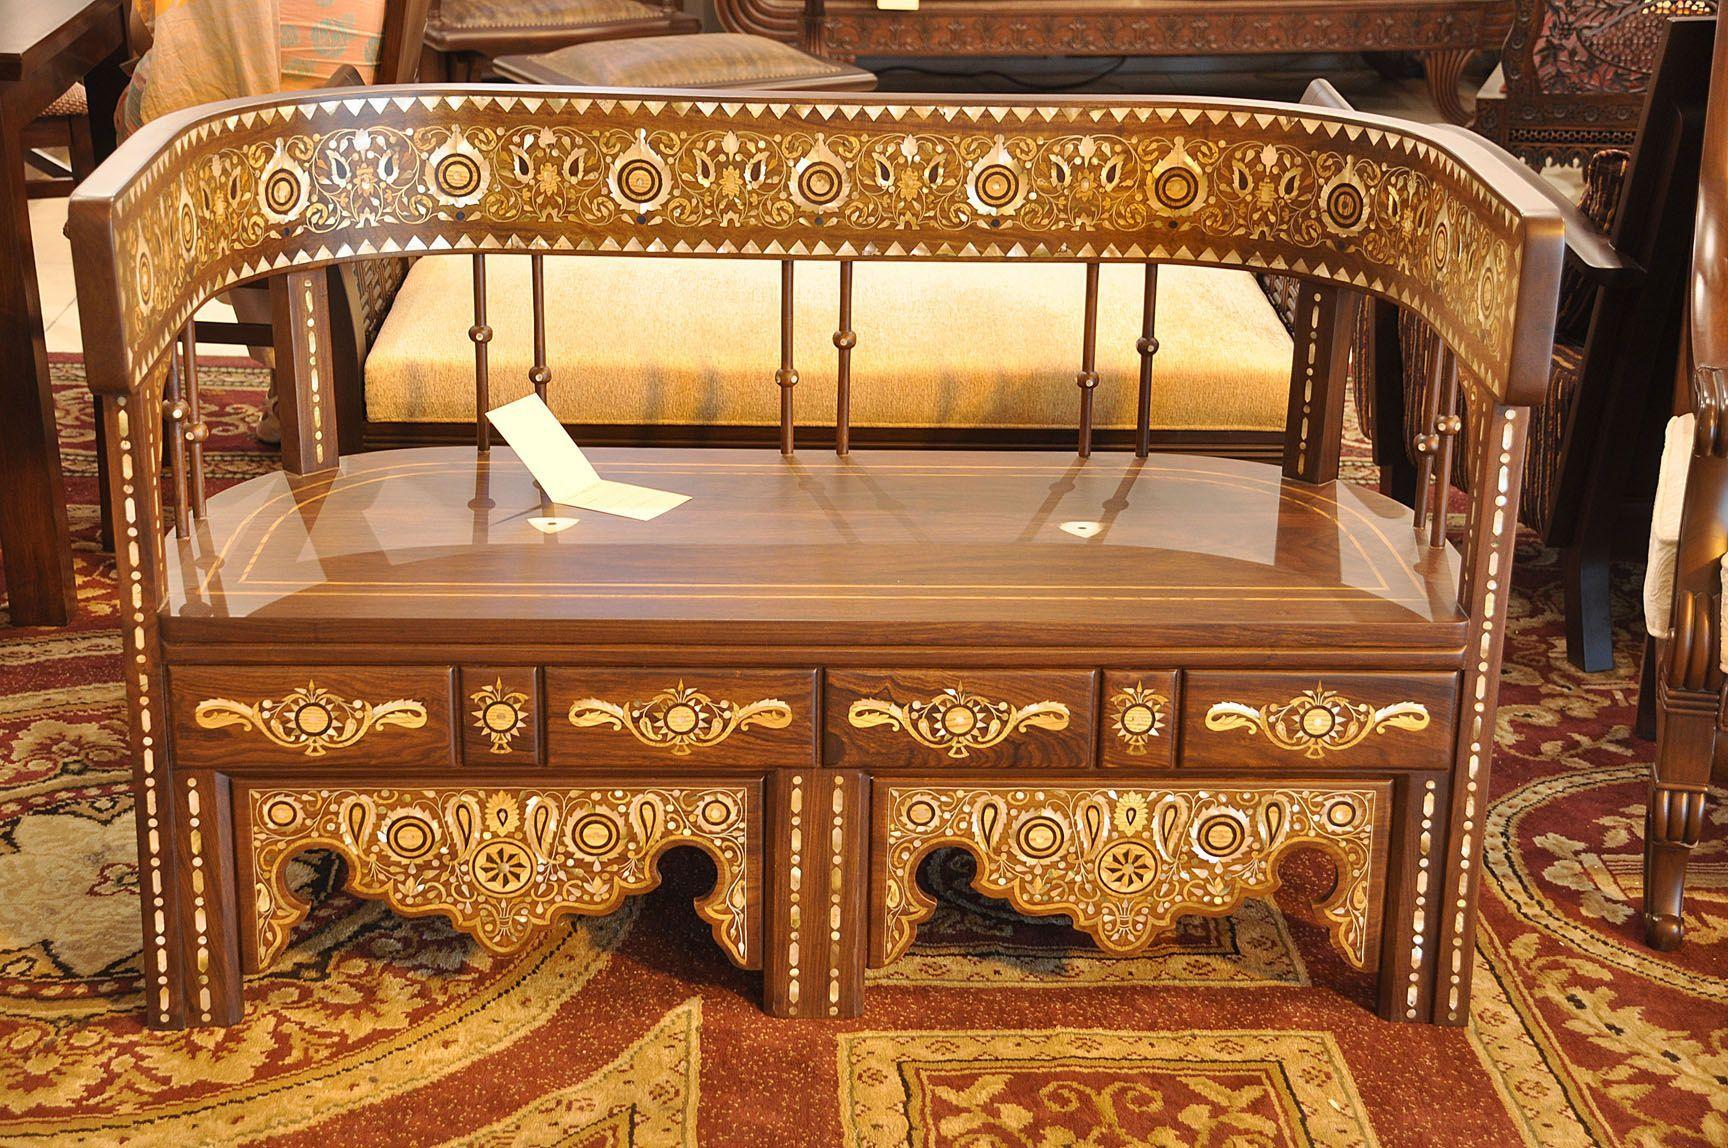 Latest Pakistani Wooden Furniture Design For Living Room Chiniot Wooden Furniture Furniture Design Wooden Bedroom Furniture Sets Arranging Bedroom Furniture #wooden #living #room #furniture #set